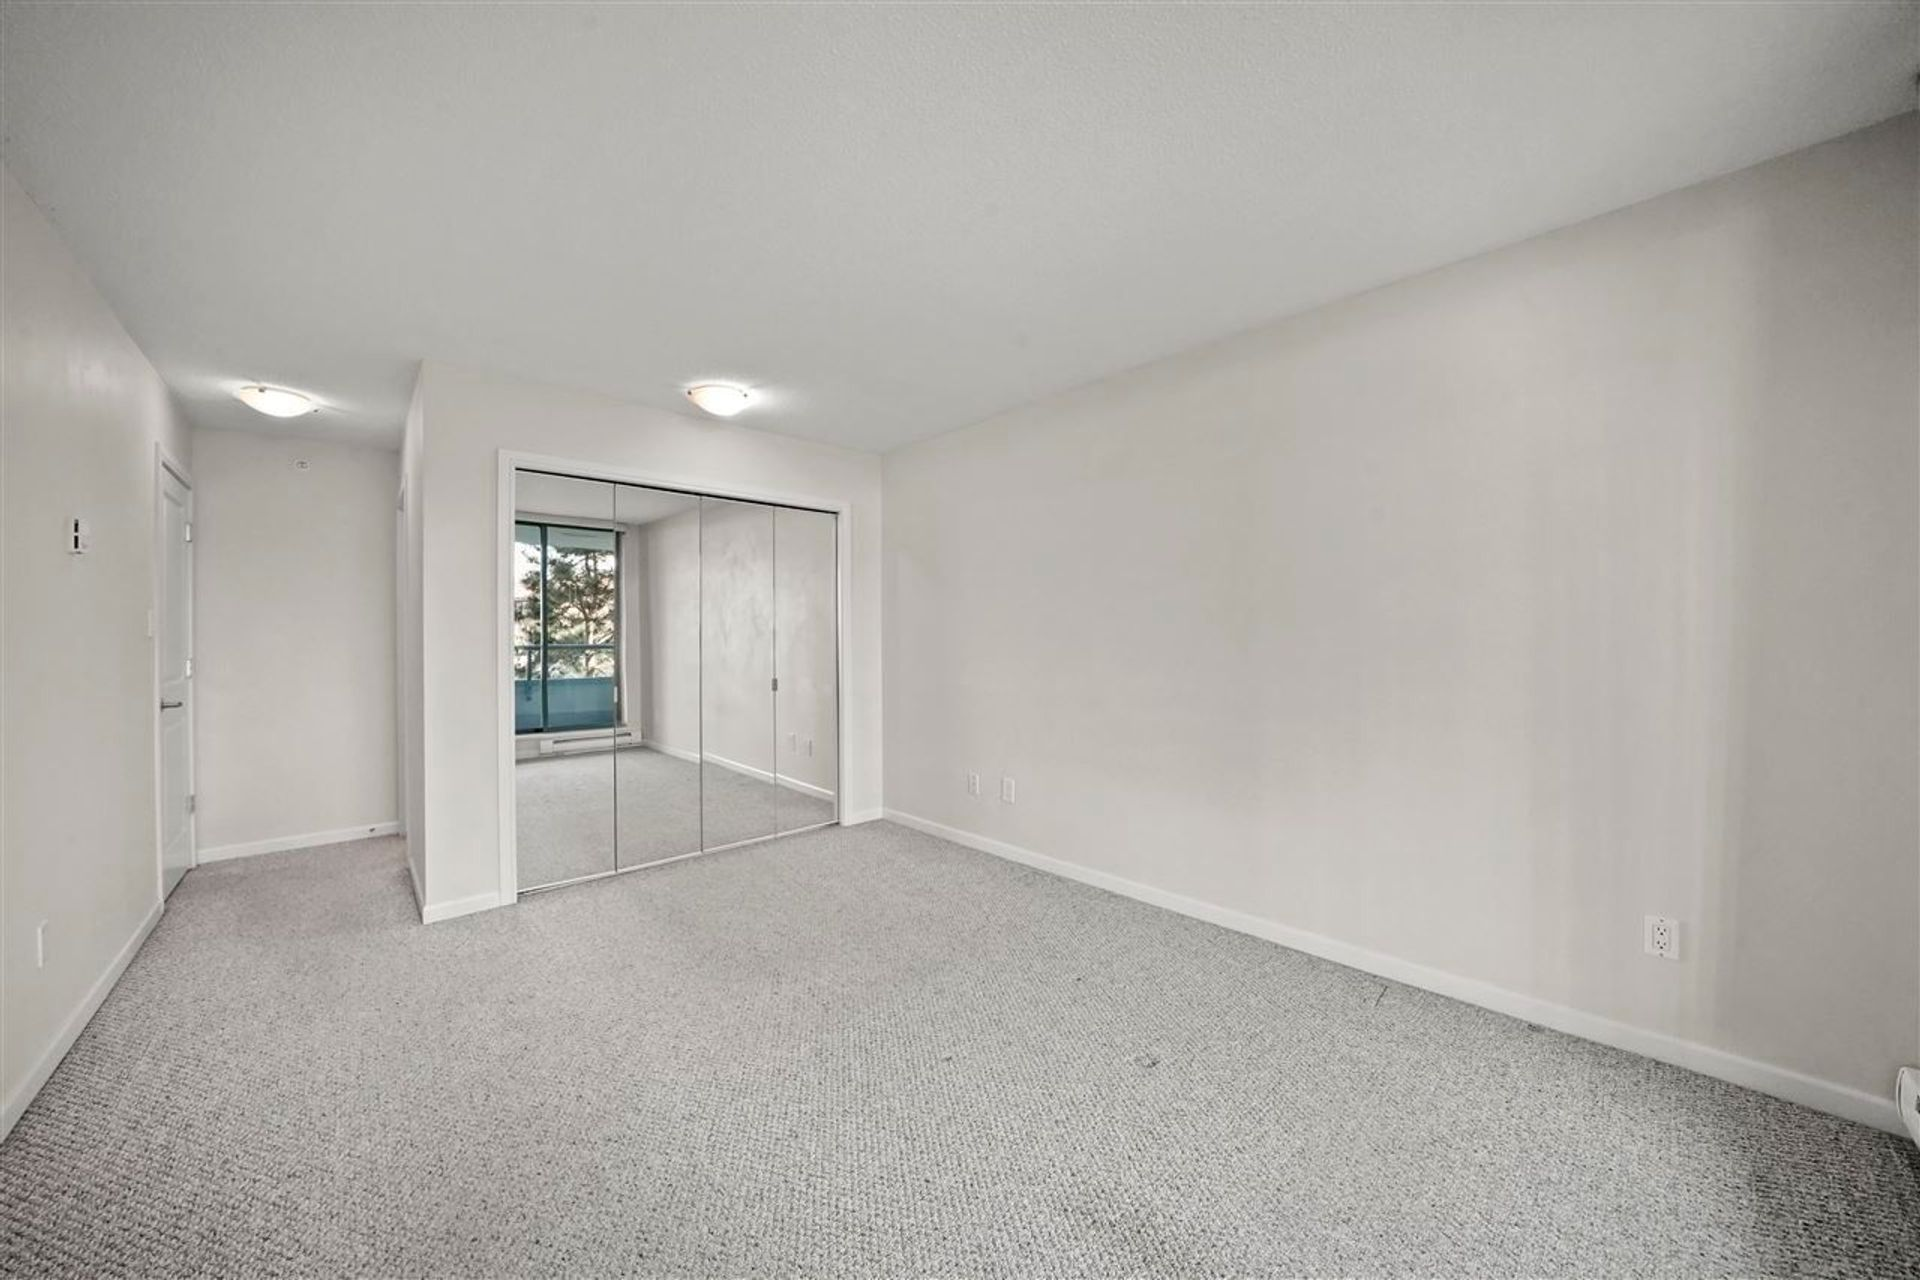 4398-buchanan-street-brentwood-park-burnaby-north-12 at 405 - 4398 Buchanan Street, Brentwood Park, Burnaby North